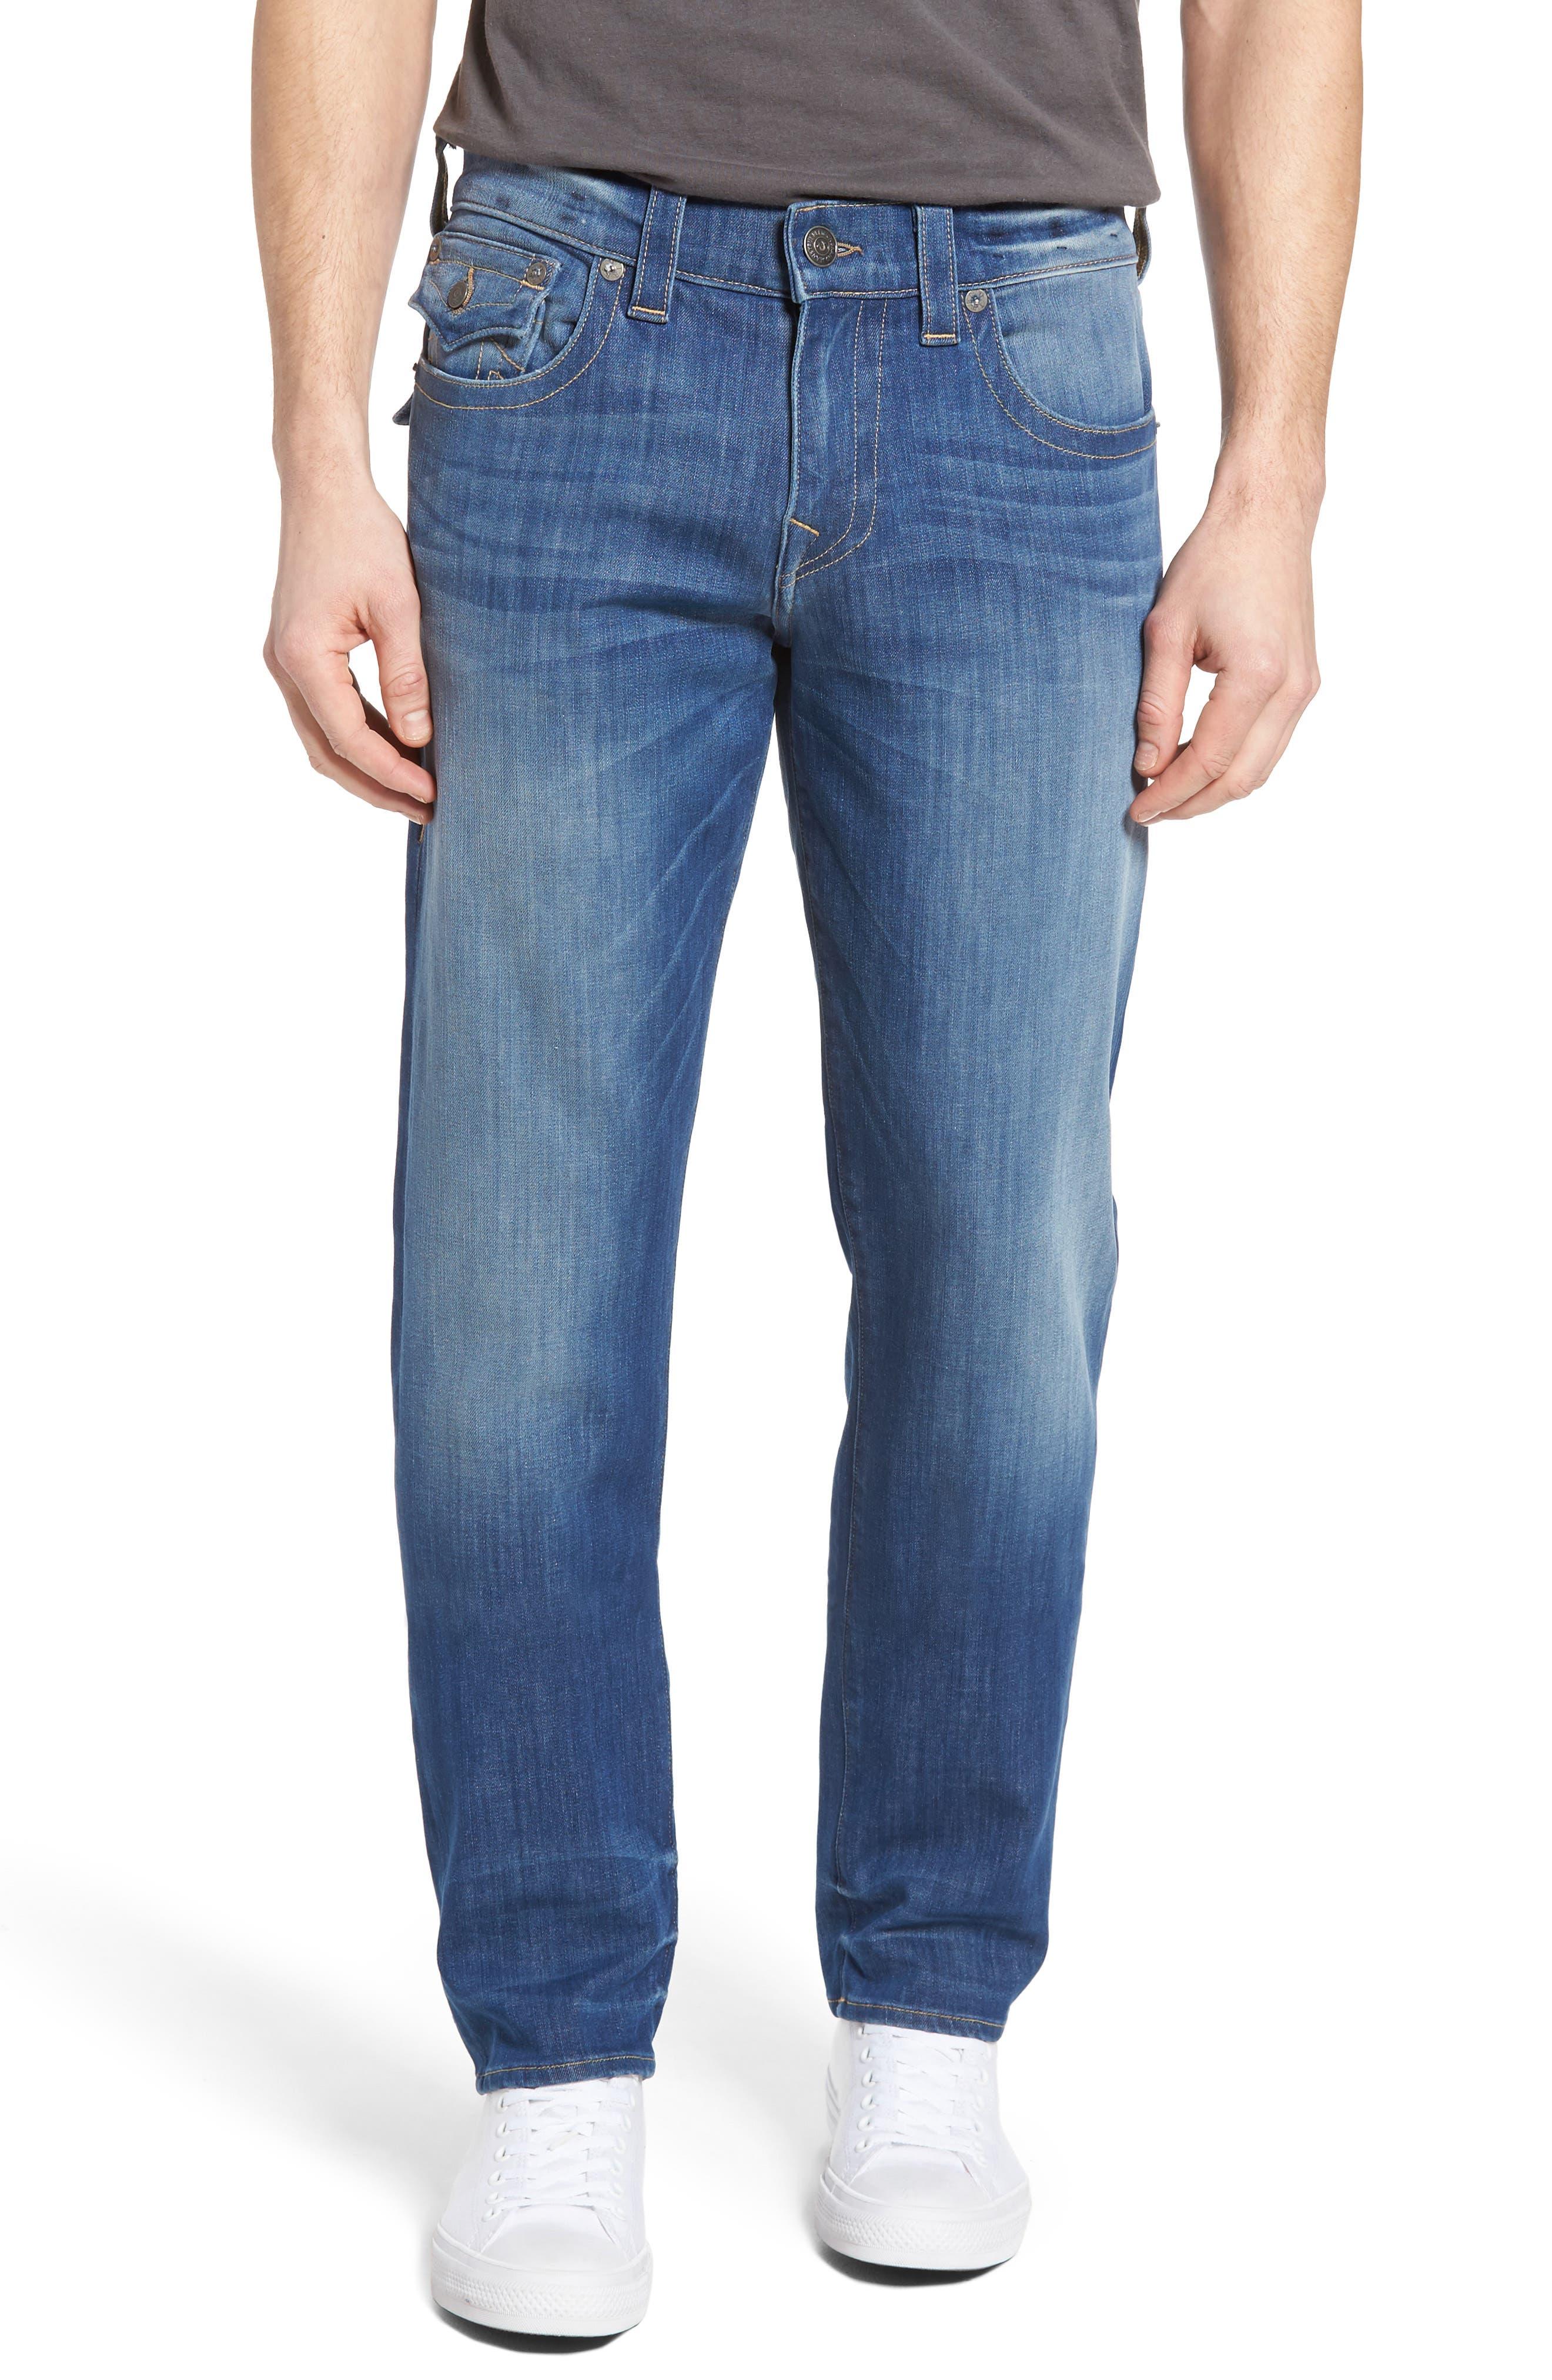 Geno Straight Leg Jeans,                             Main thumbnail 1, color,                             400